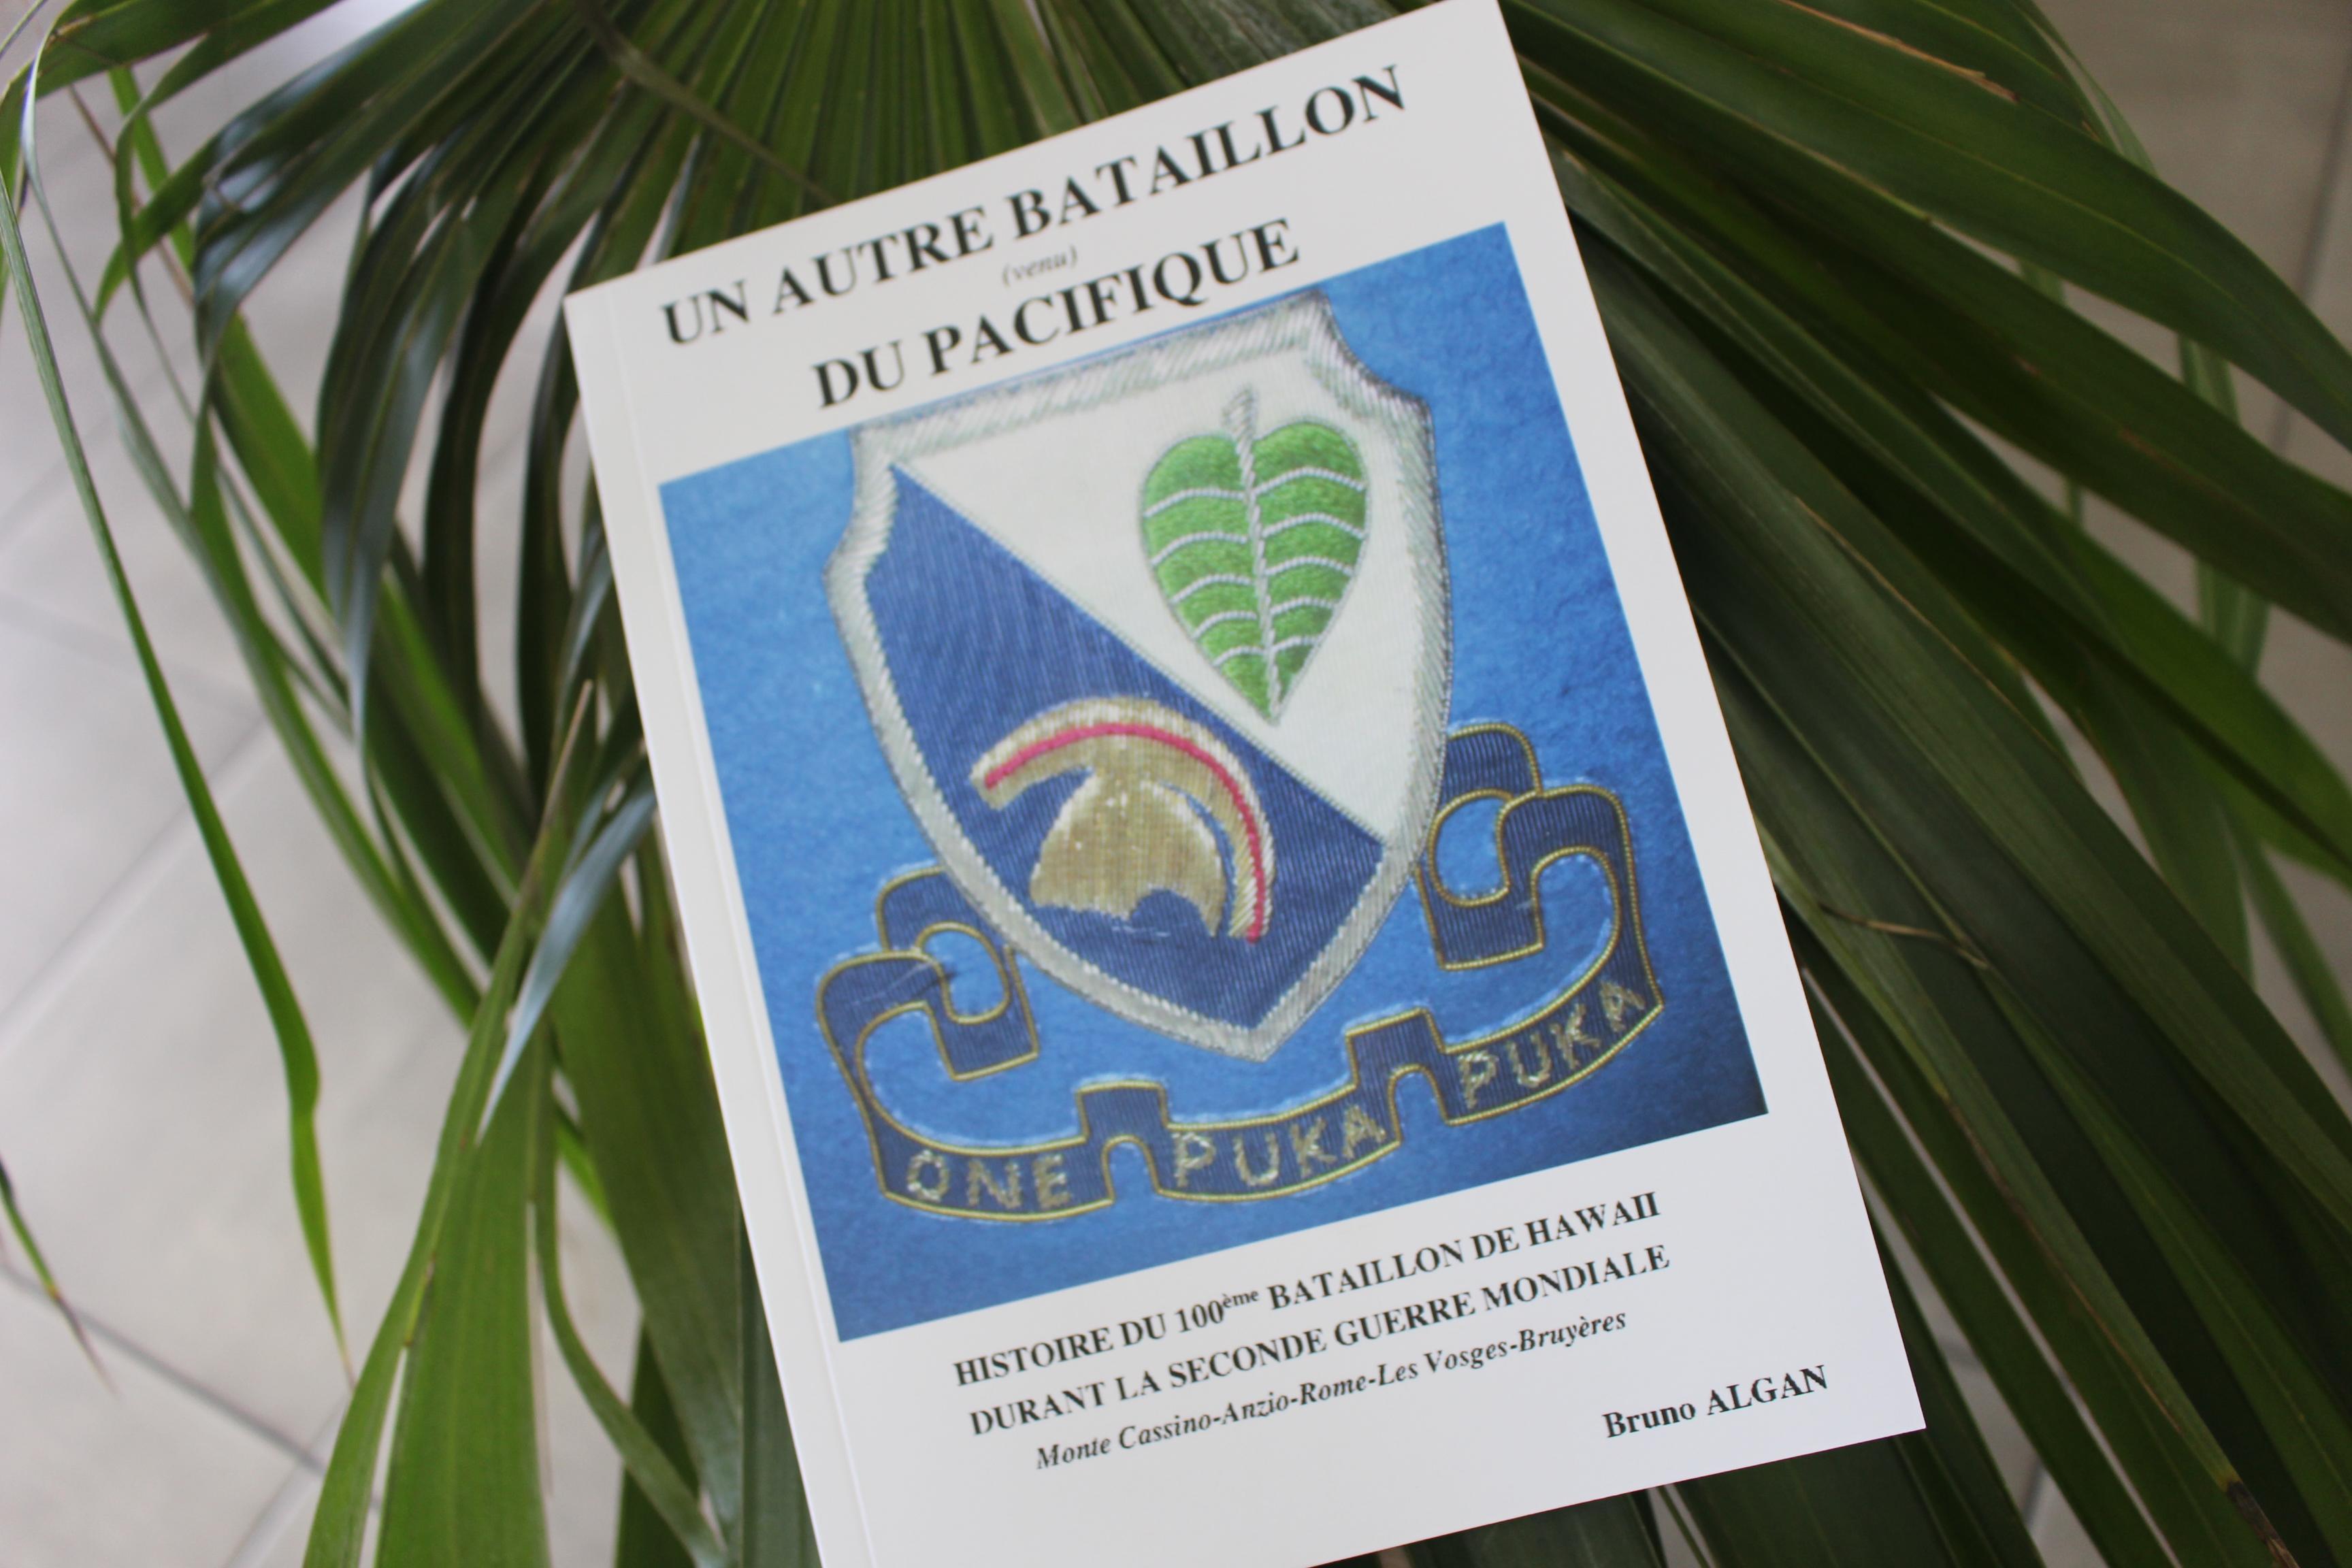 "Bruno Algan raconte ""un autre bataillon du Pacifique"", celui de Hawaii"